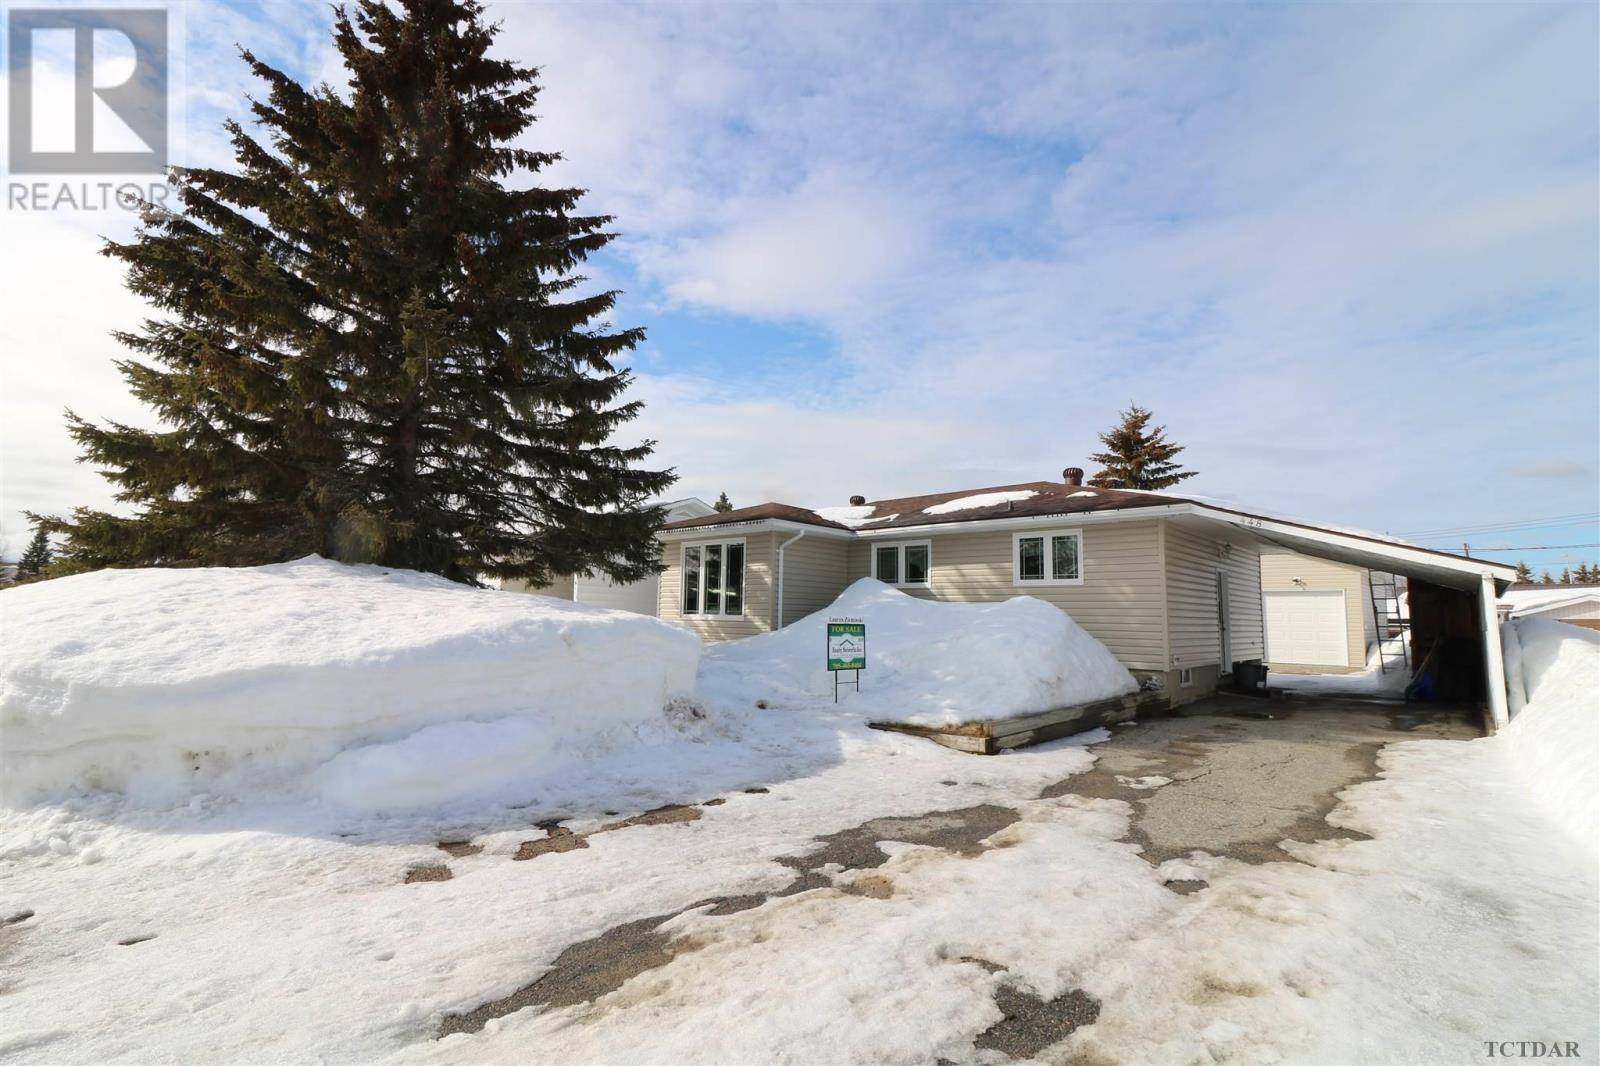 House for sale at 448 Nosov Dr Iroquois Falls Ontario - MLS: TM191266